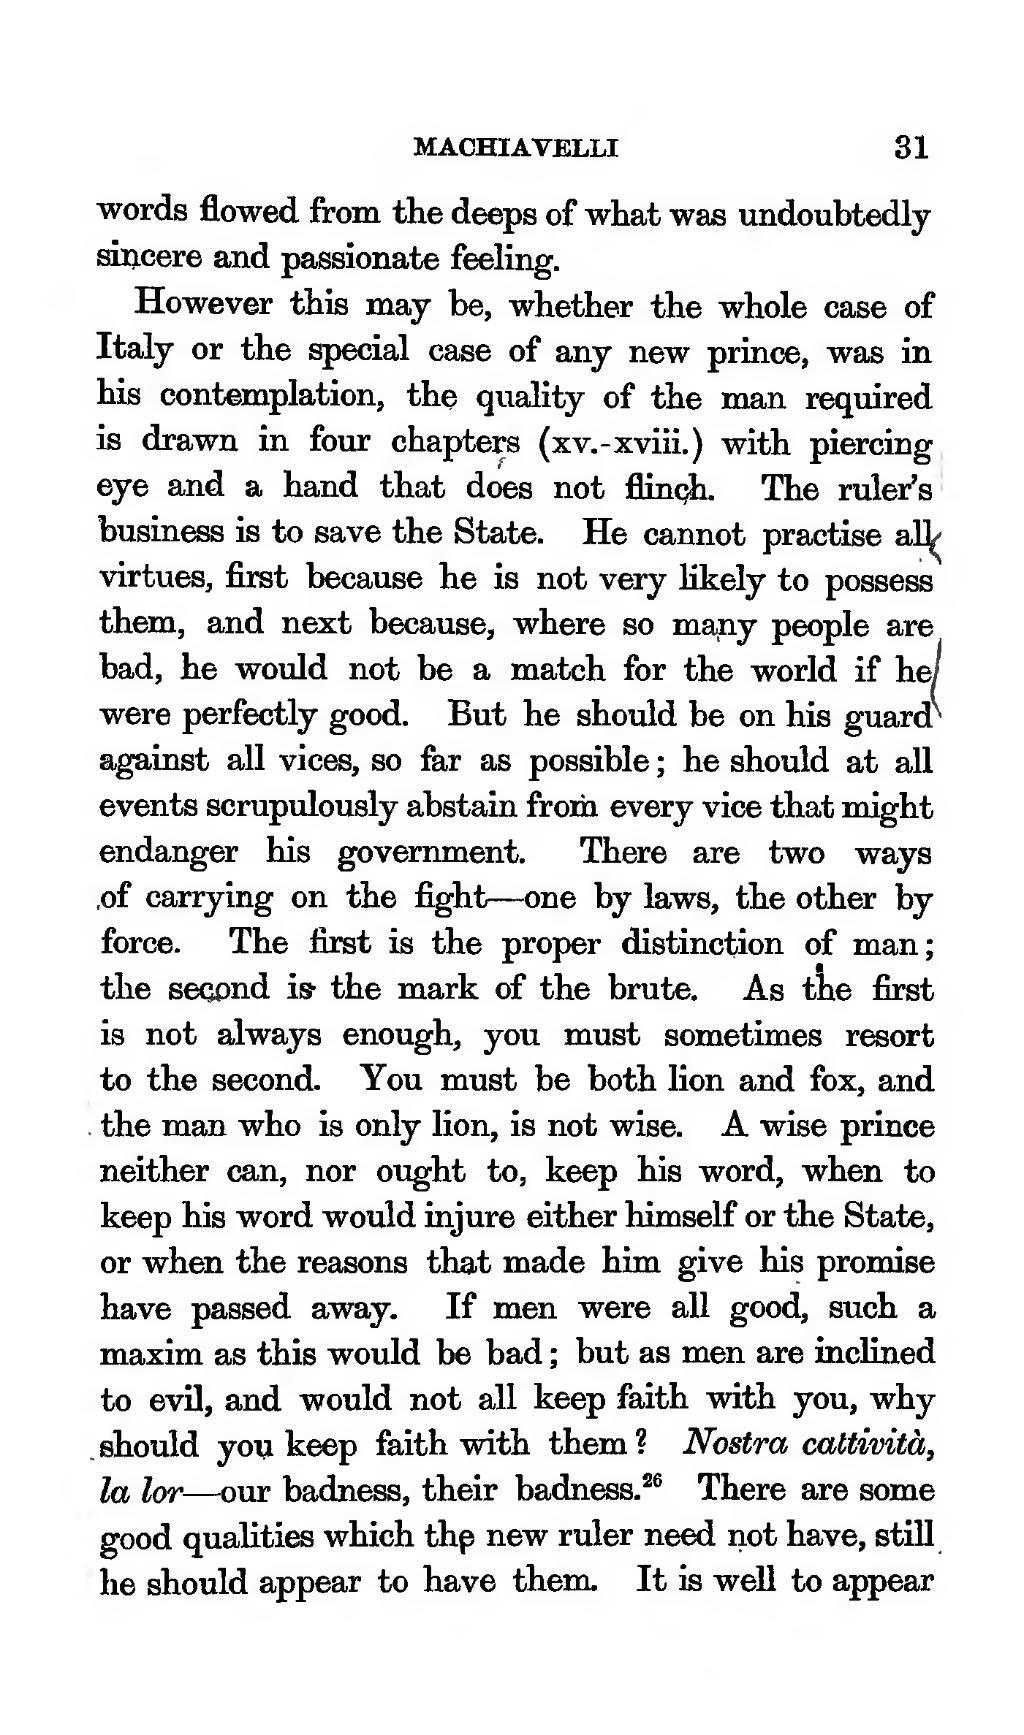 machiavelli ruler qualities